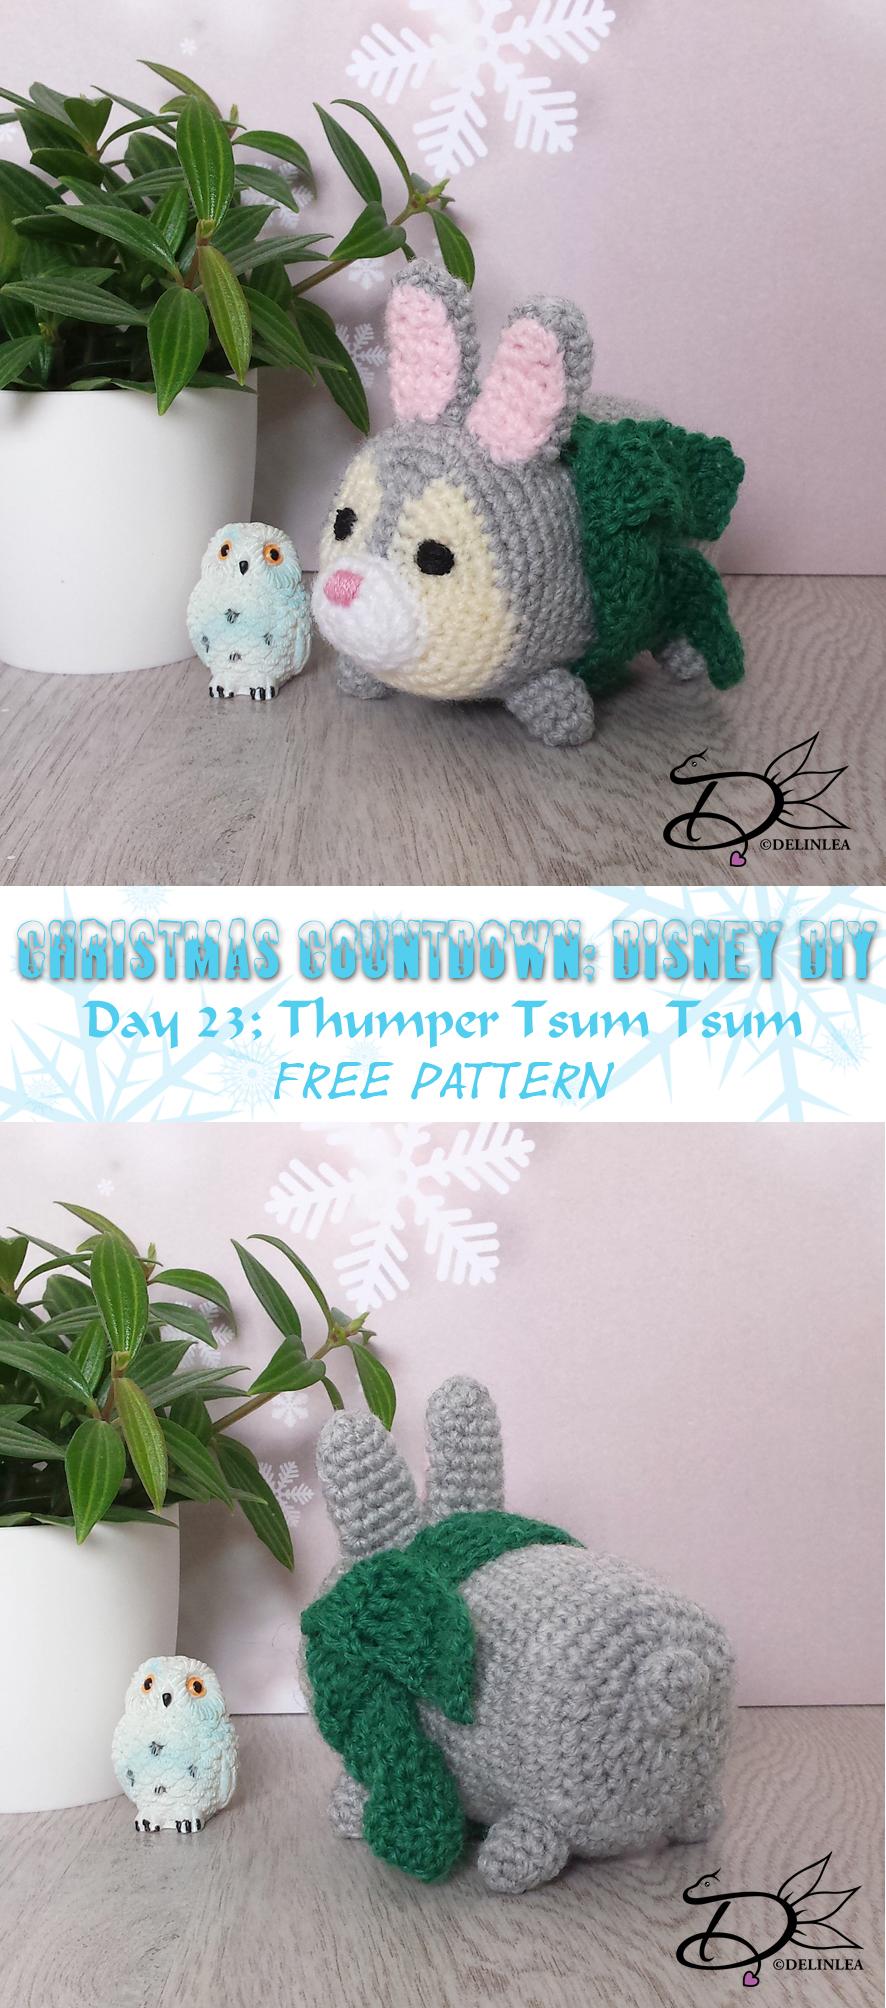 ♥ Free Pattern; Sulley Tsum Tsum Amigurumi - Delinlea - My little ... | 2008x886